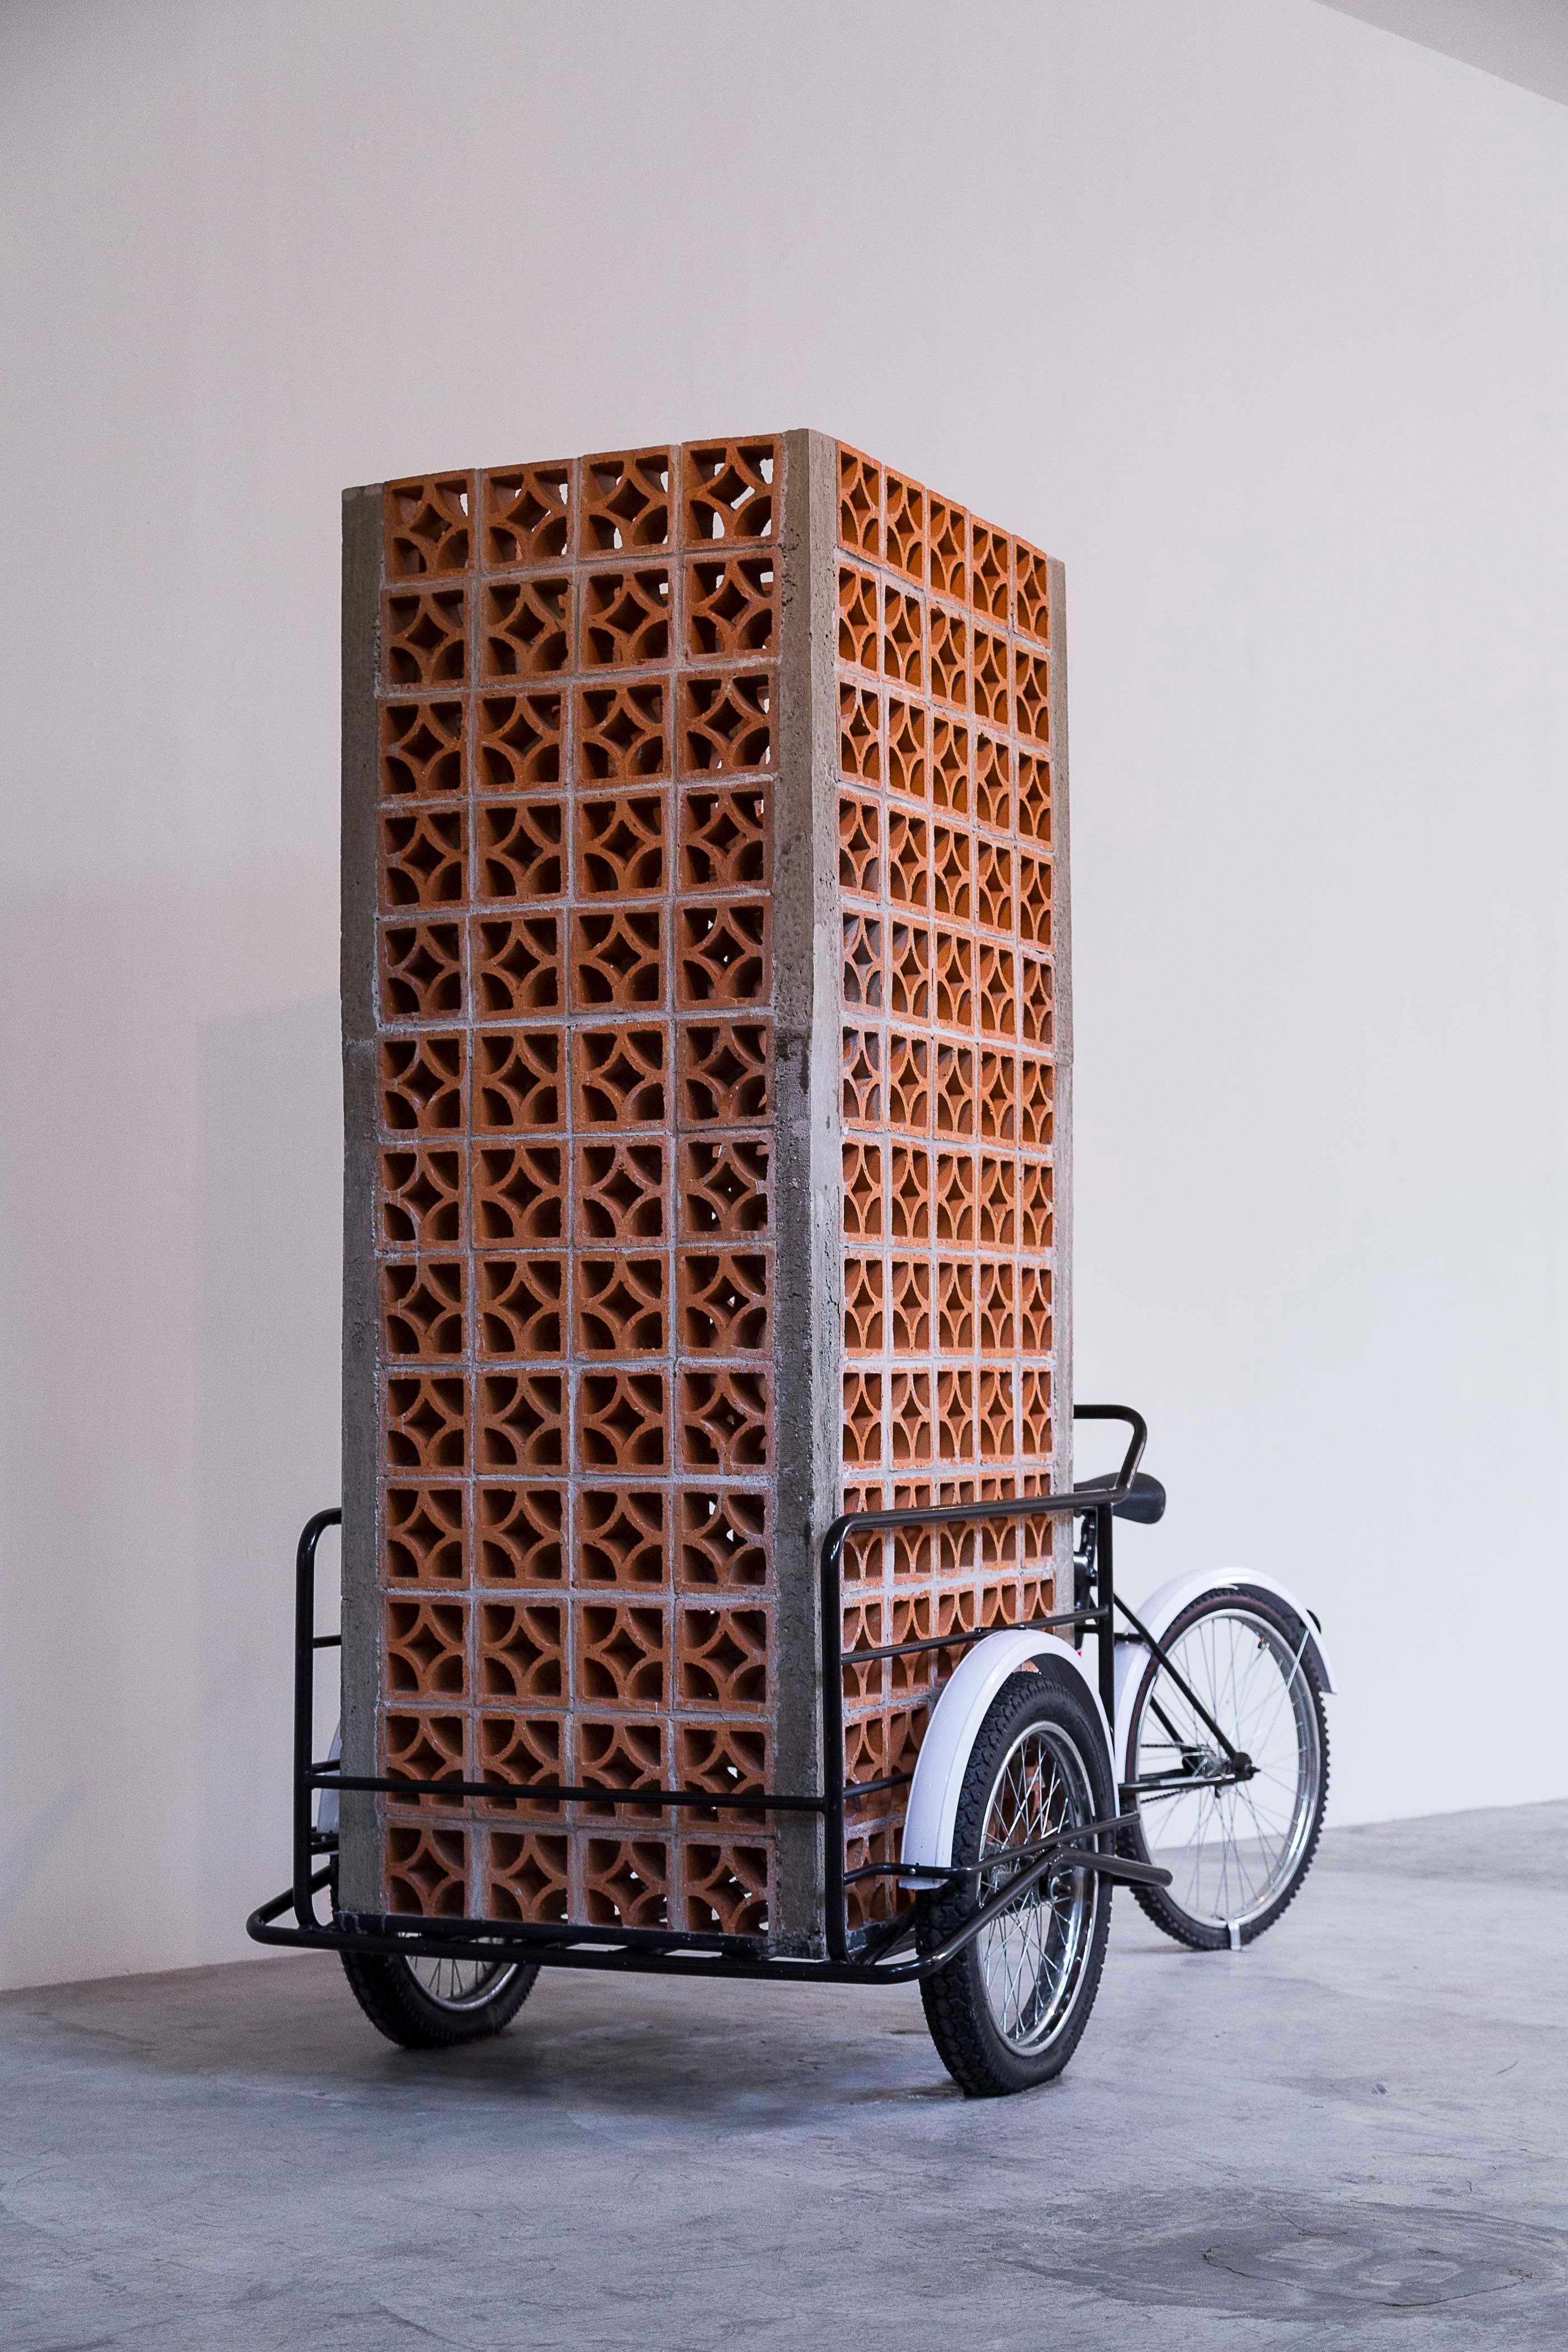 PROTOGEOMETRÍAS   Cemento, arena, alambrón, alambre, celosía, triciclo de venta   2013